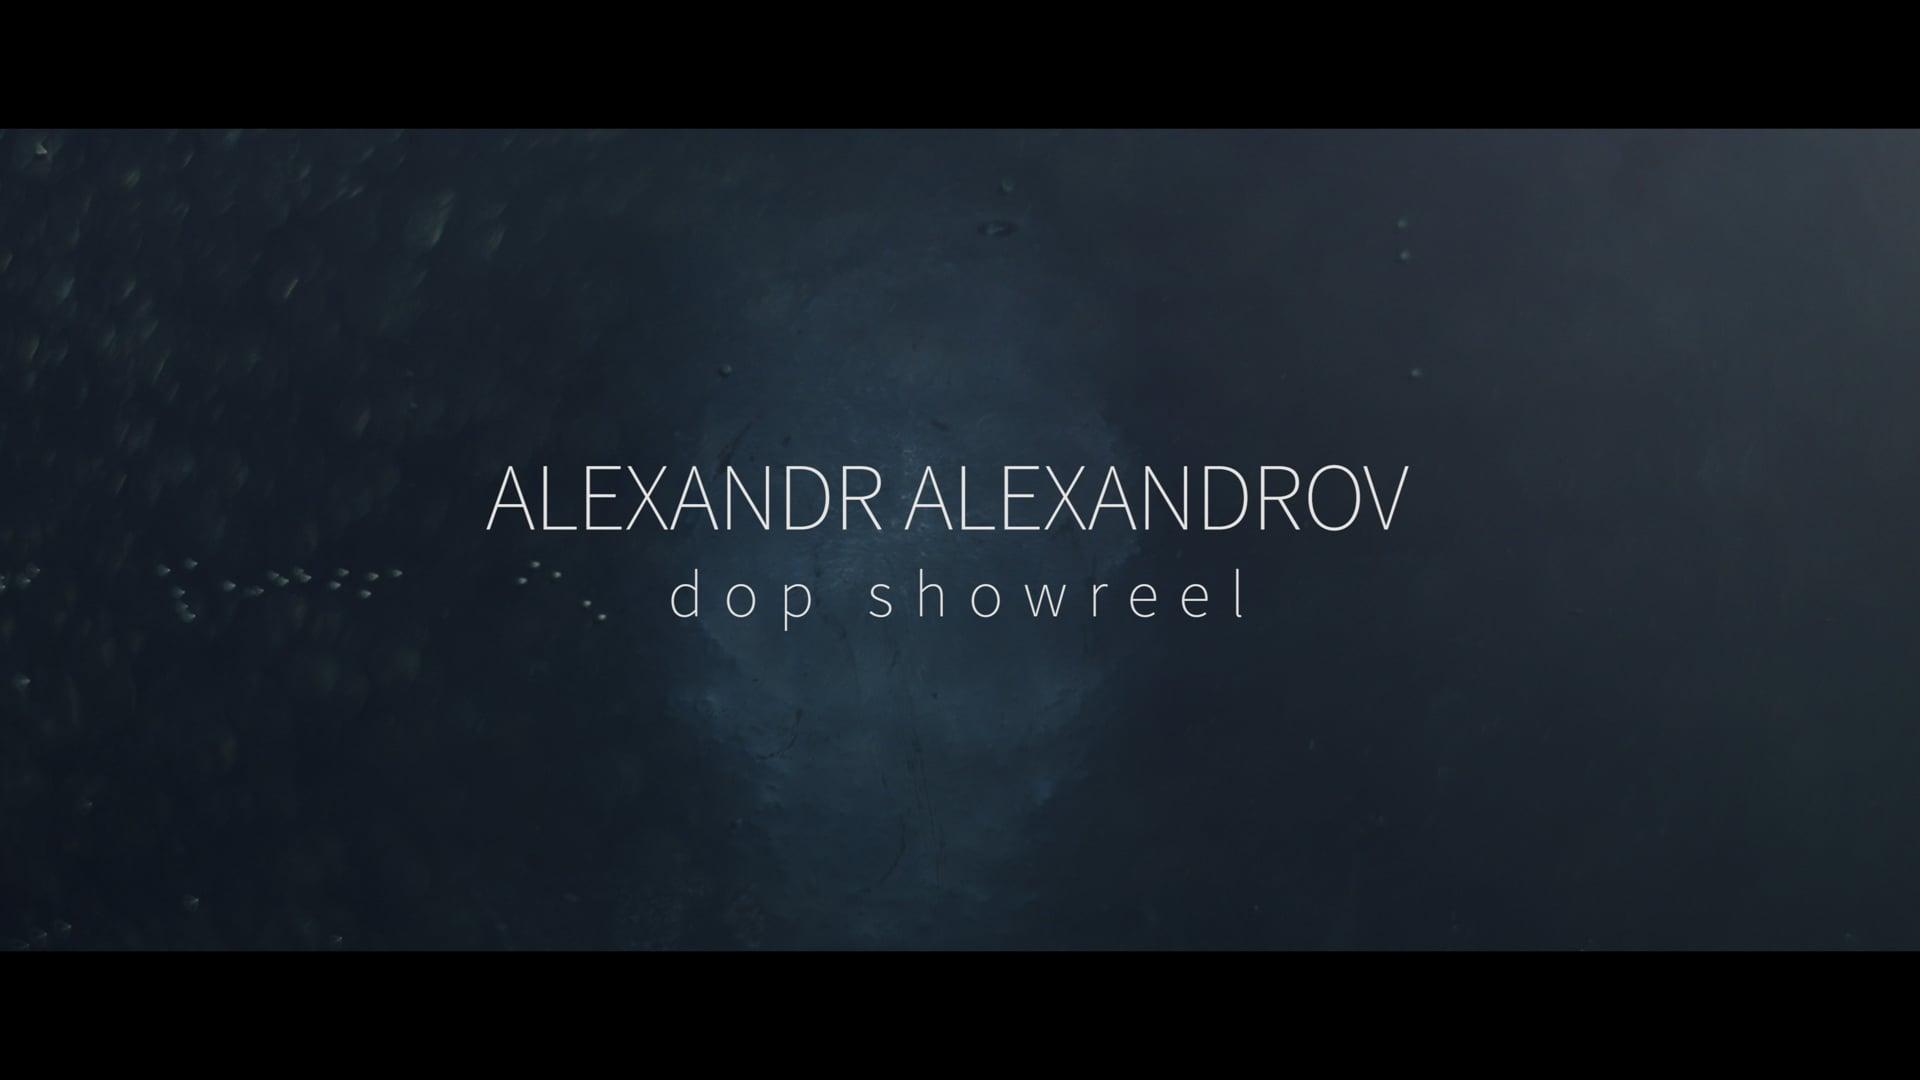 Alexsandr Alexsandrov DOP showreel